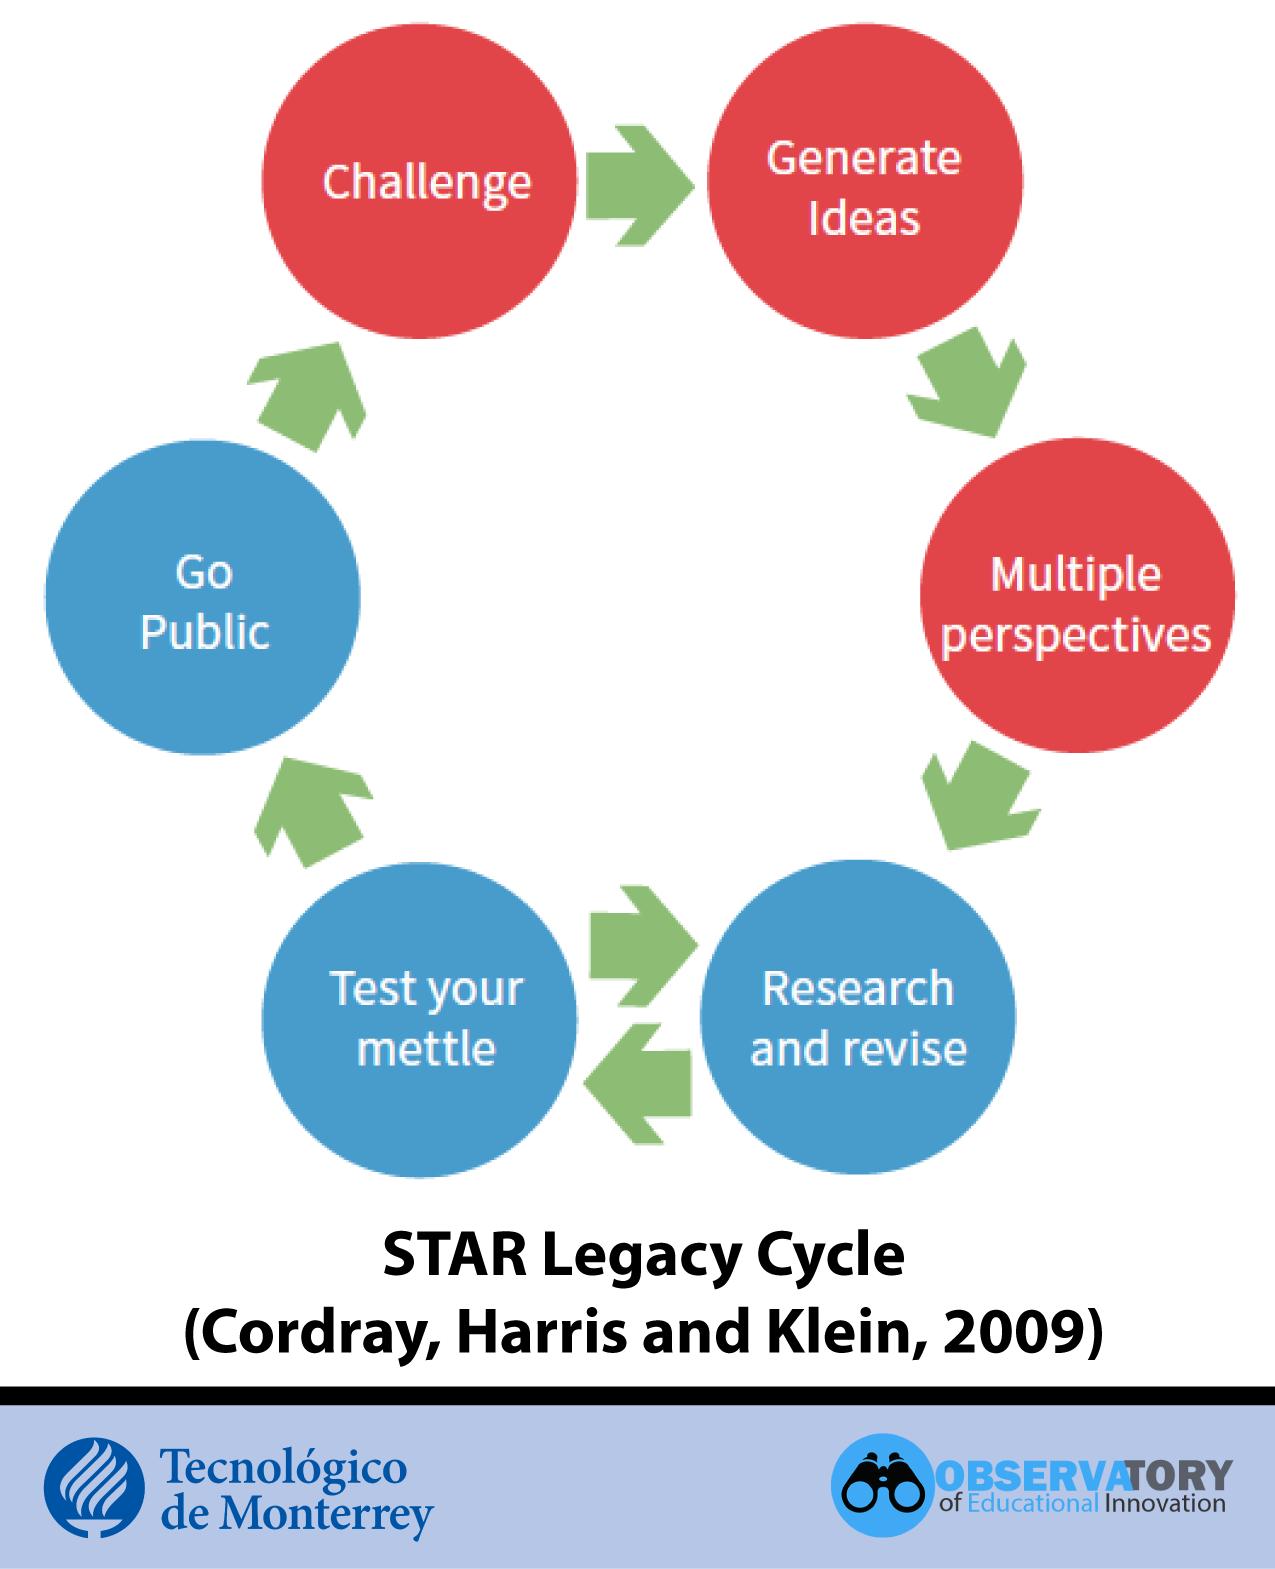 STAR Legacy Cycle